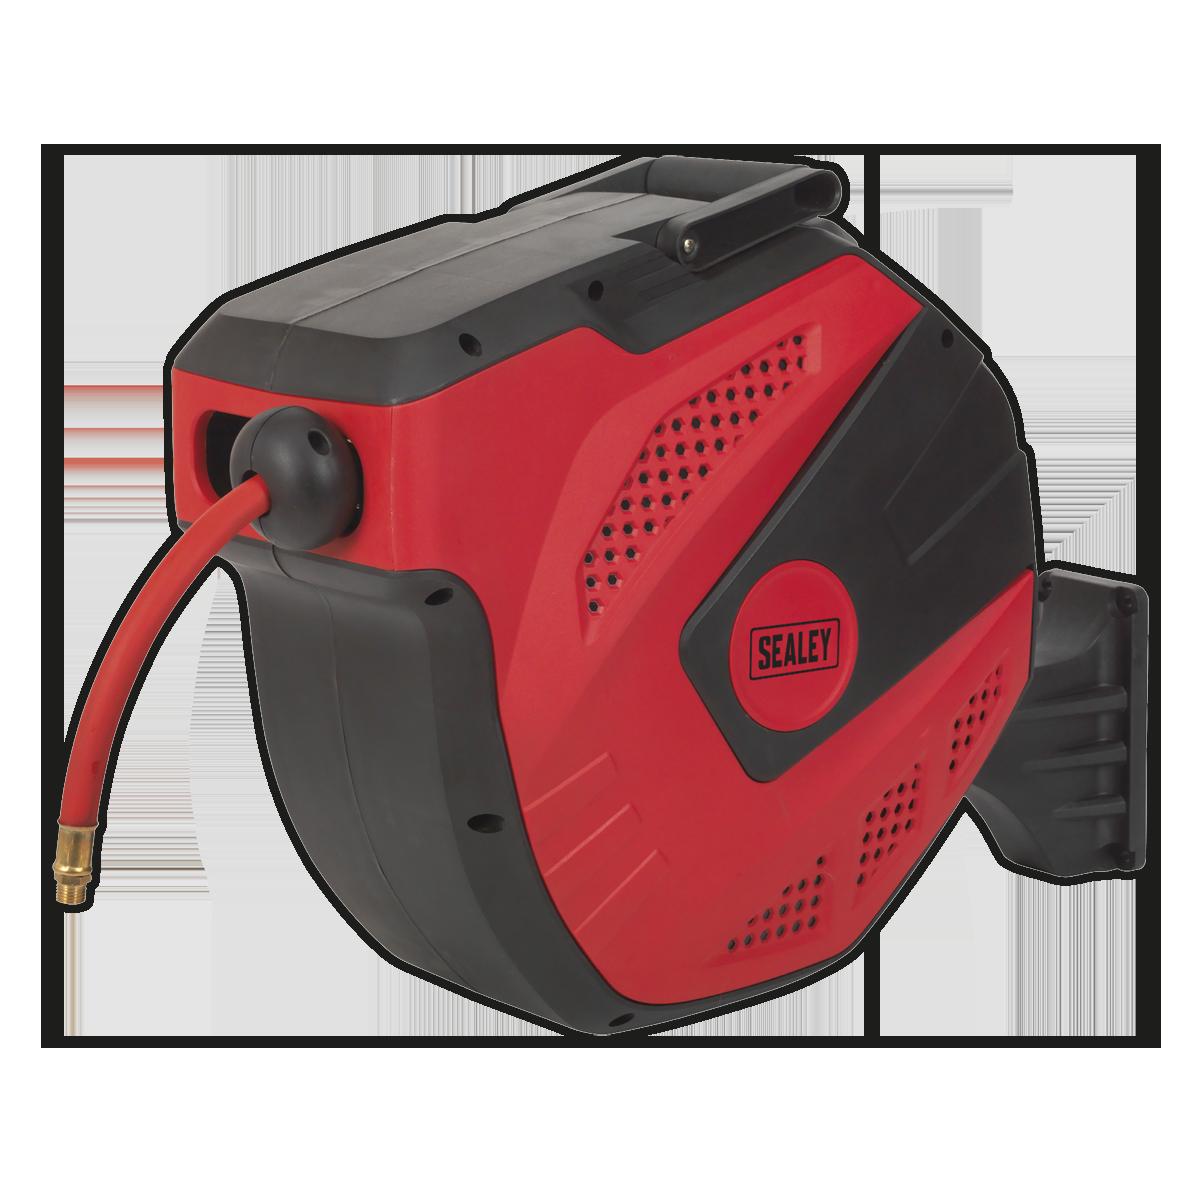 Air Hose Reel Auto-Rewind Control 15m Ø10mm ID - Rubber Hose